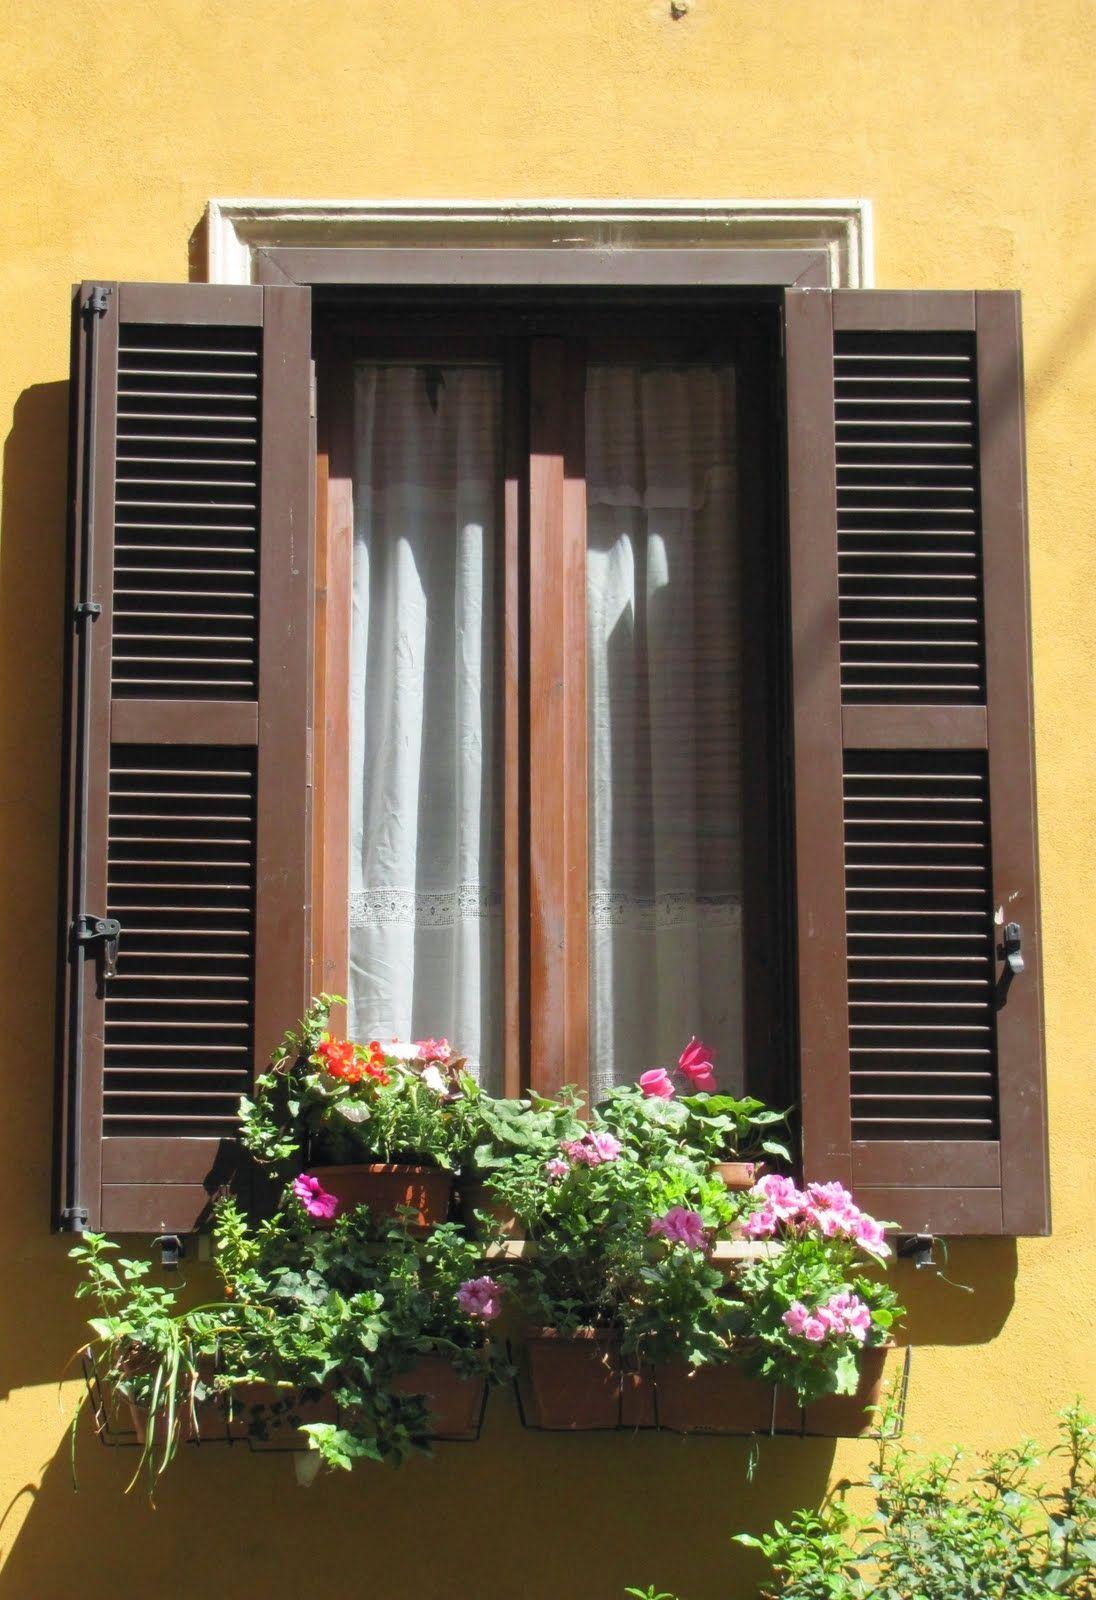 Maleta de recortes ventanas r sticas ventanas en 2019 for Ventanas de madera rusticas precio